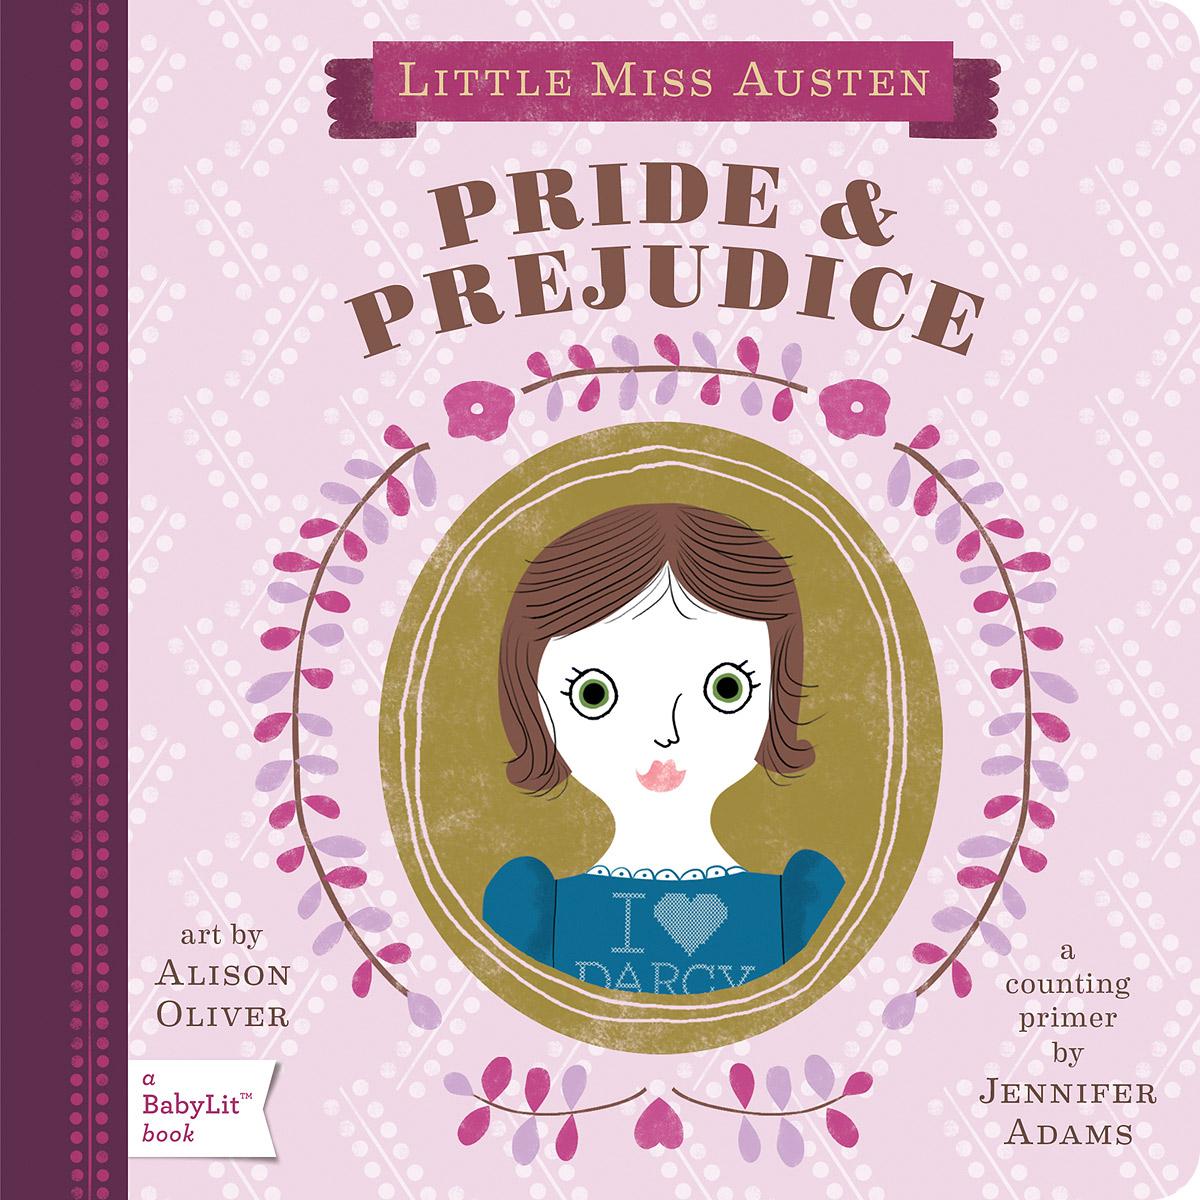 Little Miss Austen: Pride & Prejudice